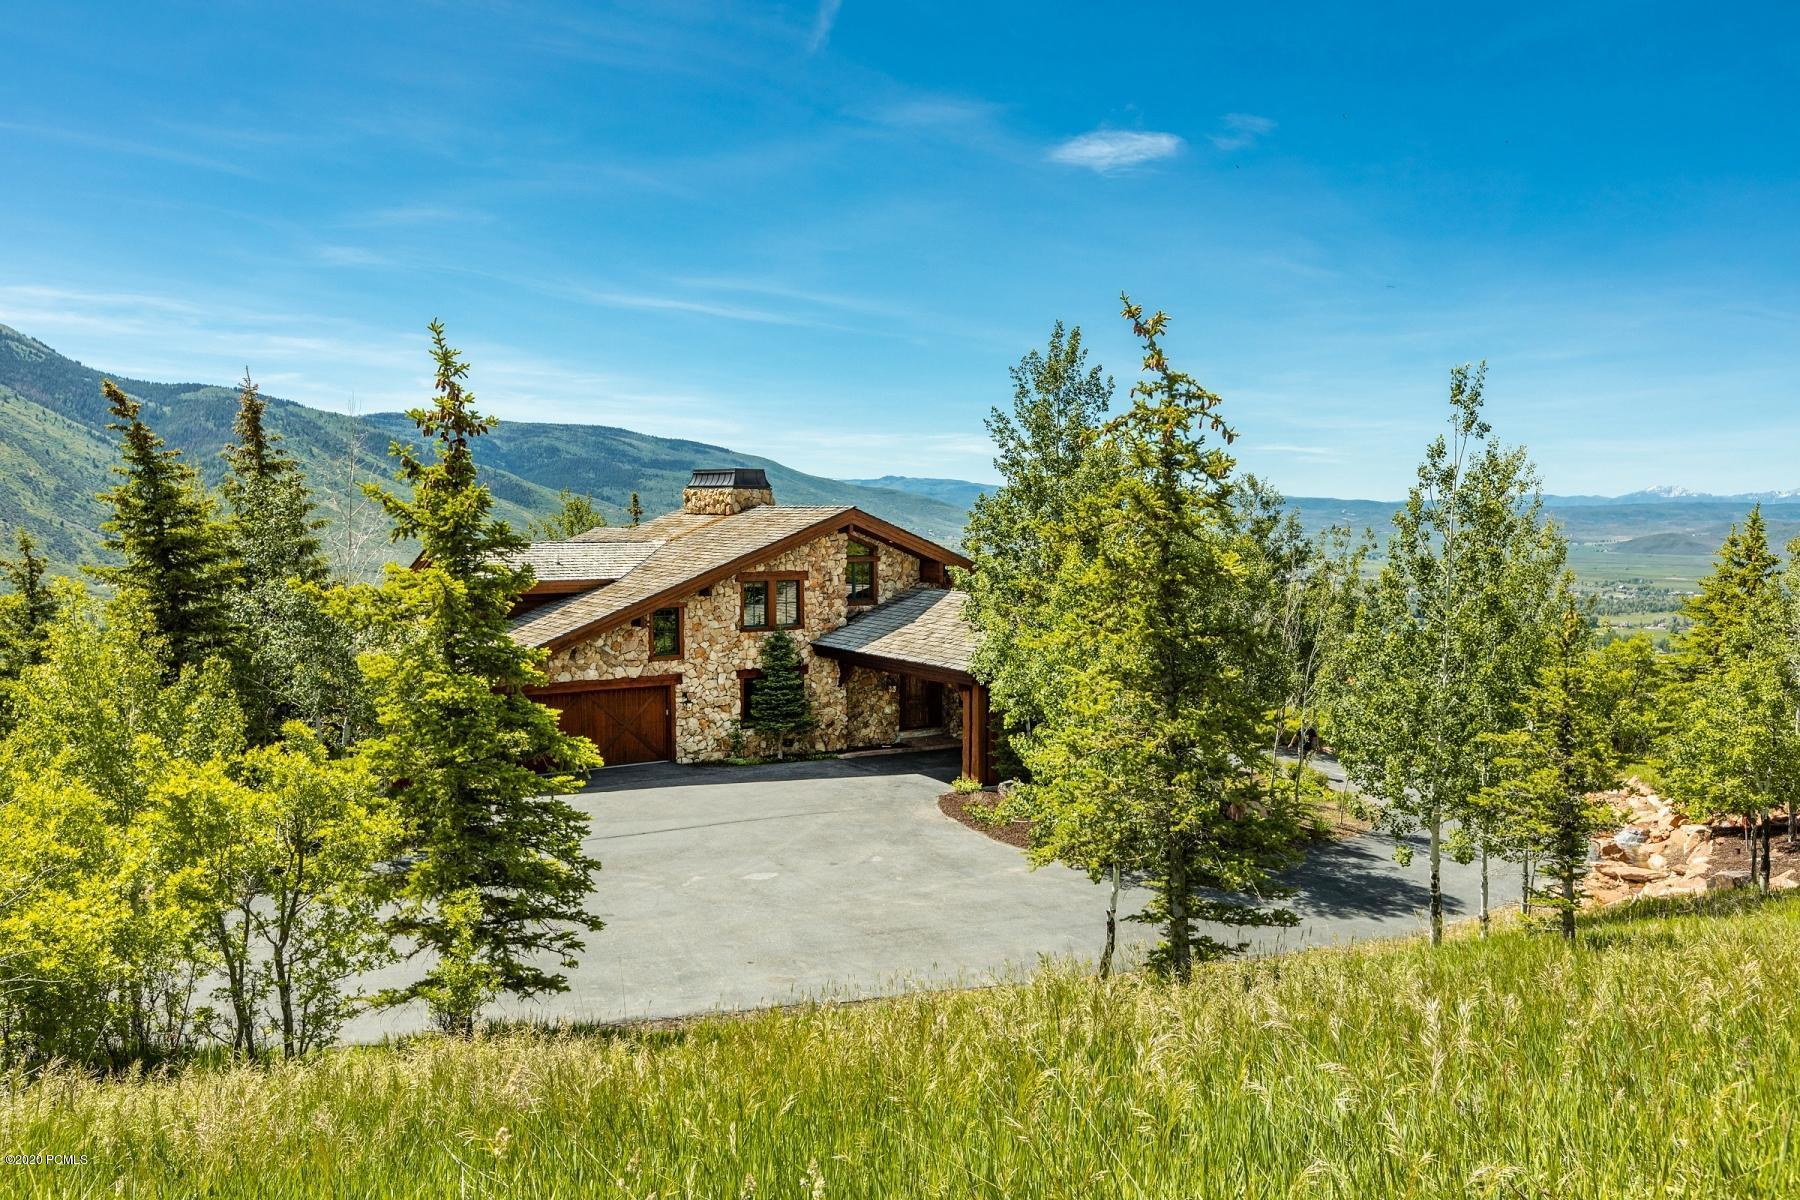 6019 Maple Ridge Trail, Oakley, Utah 84055, 6 Bedrooms Bedrooms, ,6 BathroomsBathrooms,Single Family,For Sale,Maple Ridge,20190109112430415765000000